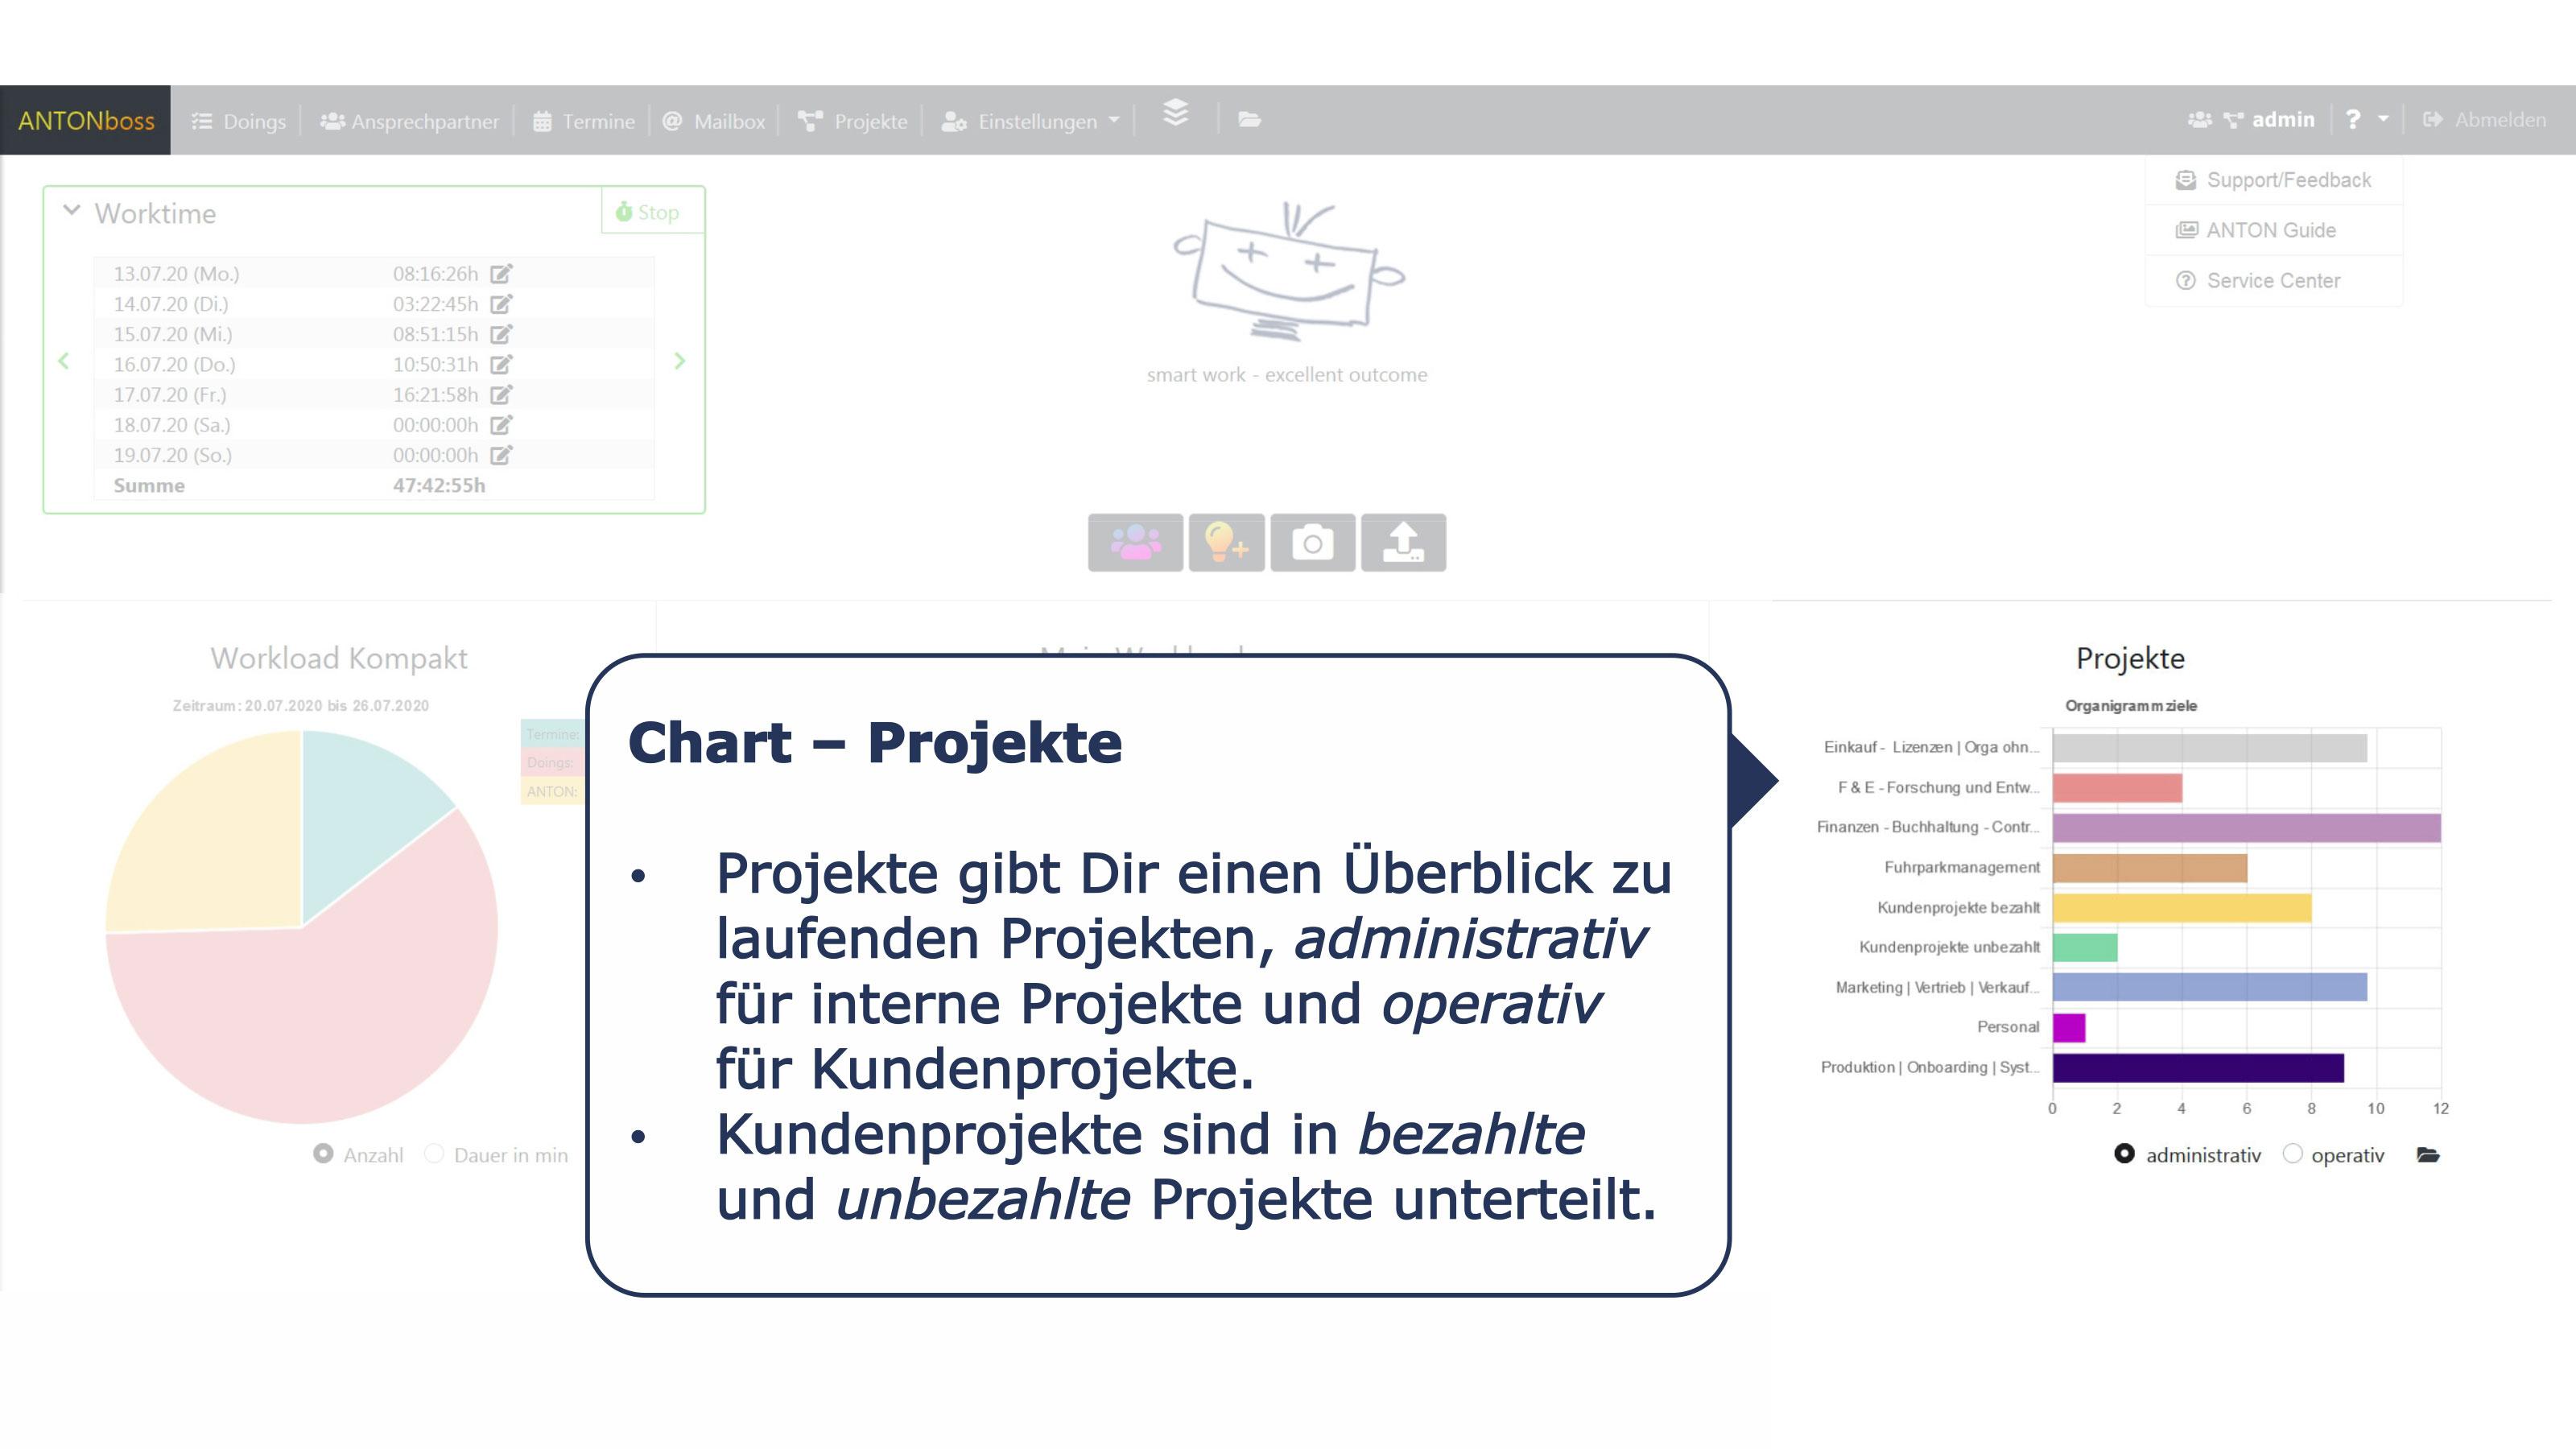 Chart Projekte